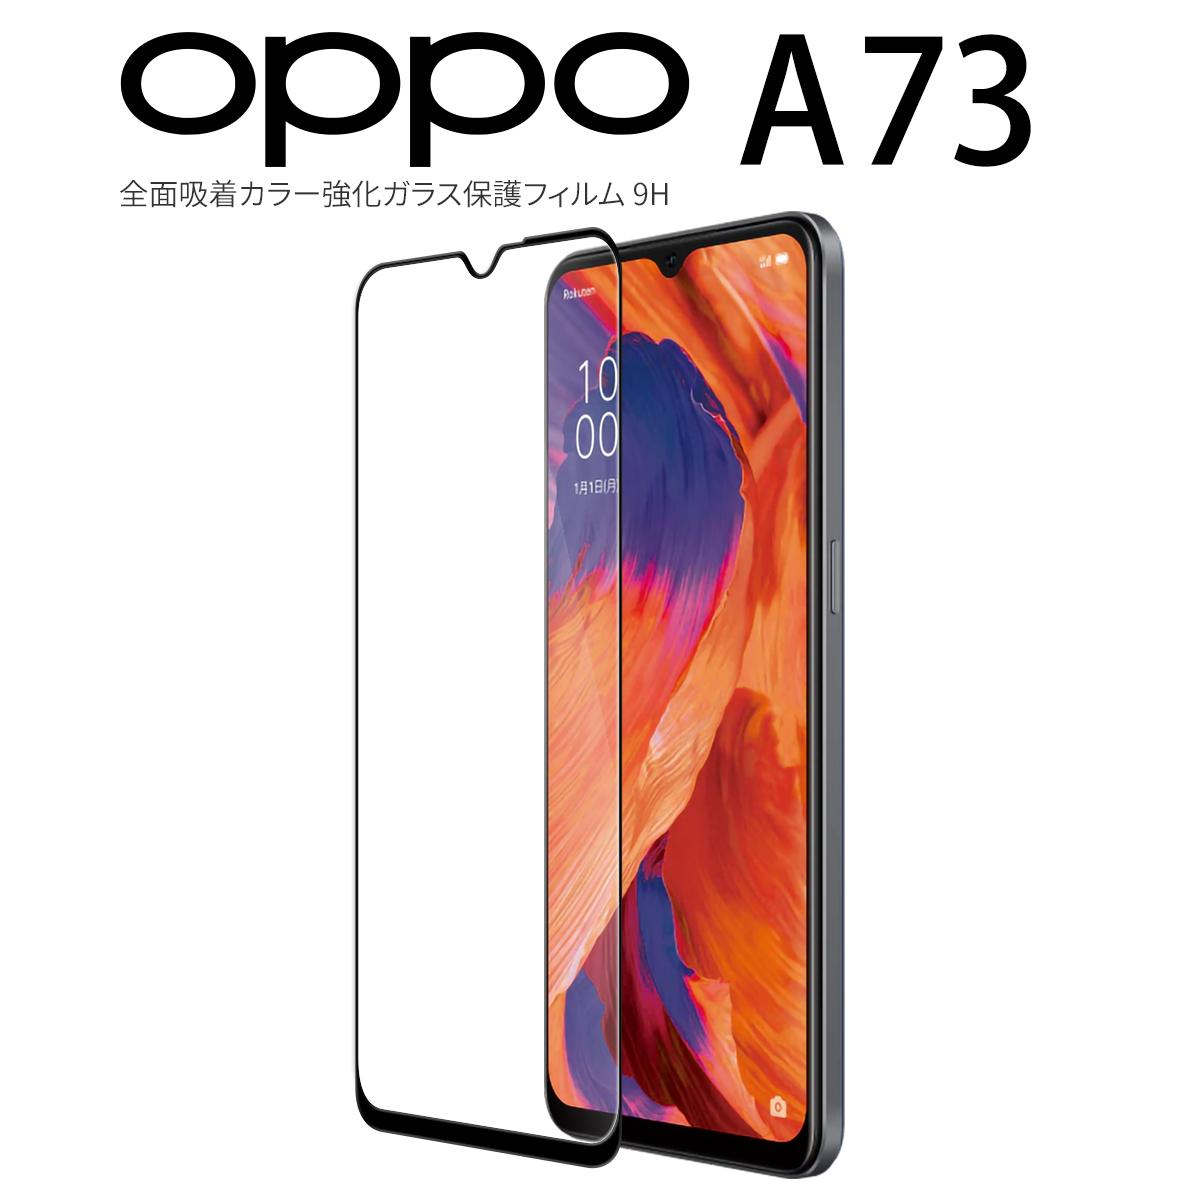 OPPO A73 全面吸着カラー強化ガラス保護フィルム 9H